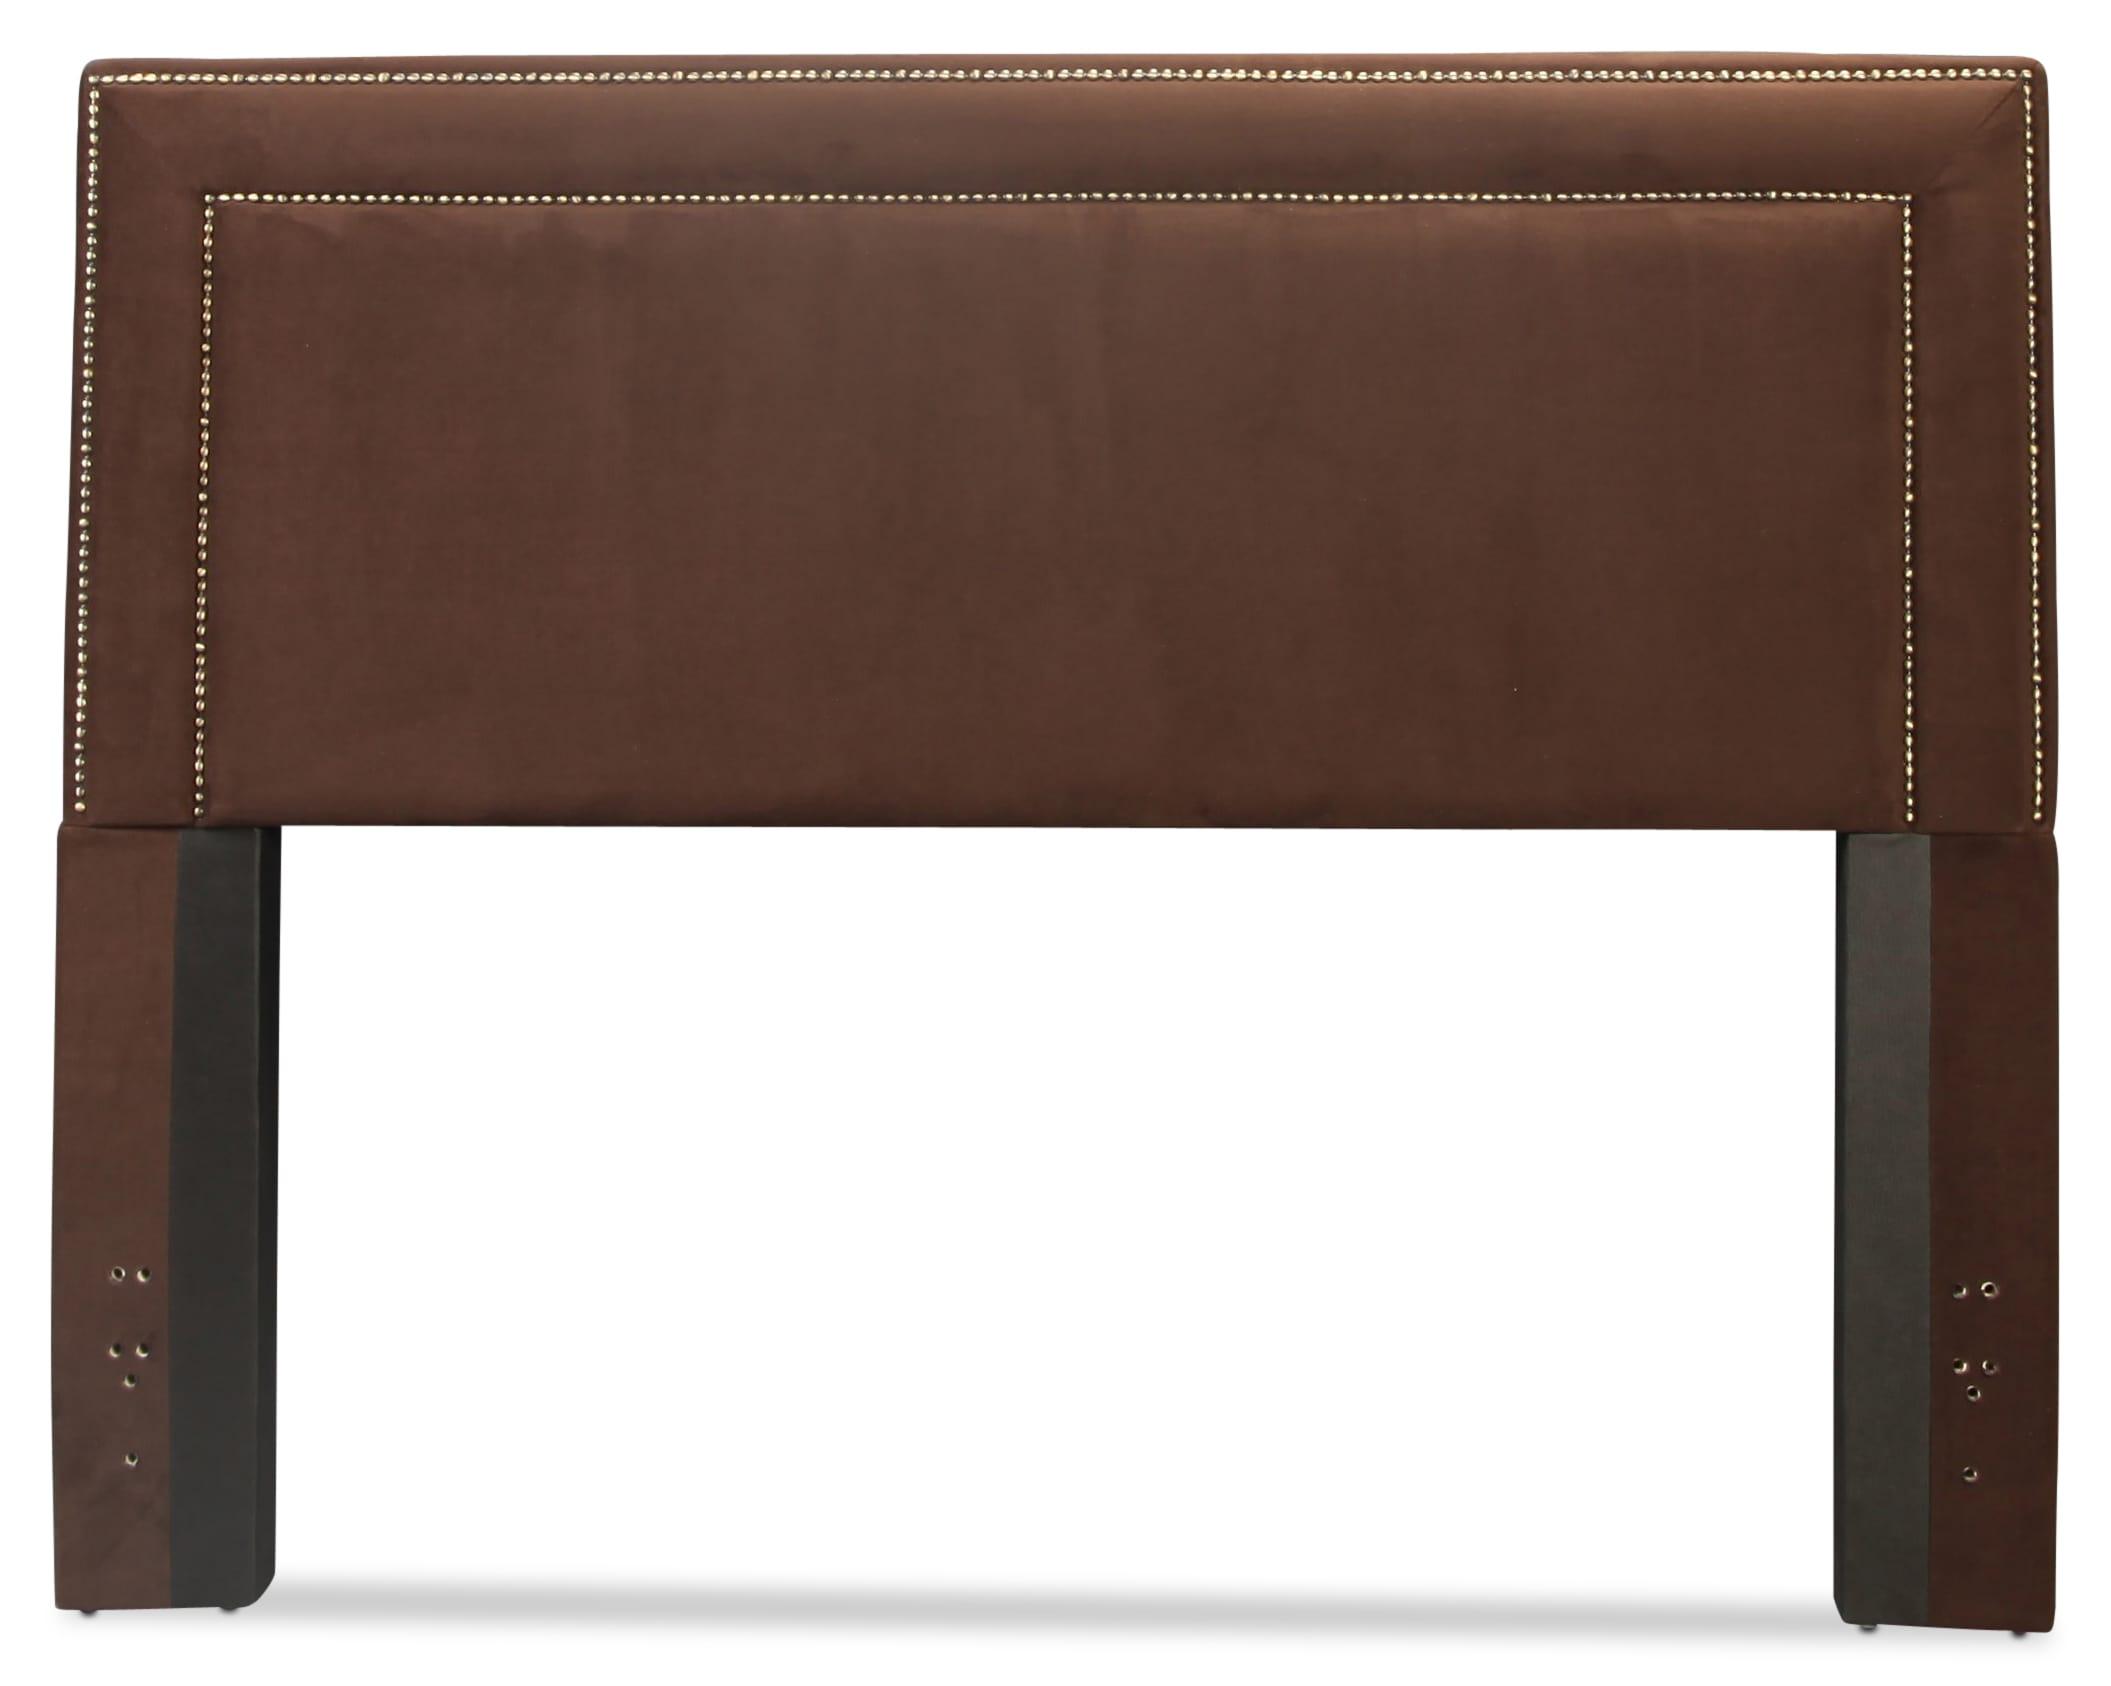 Amber Queen Upholstered Headboard - Chocolate